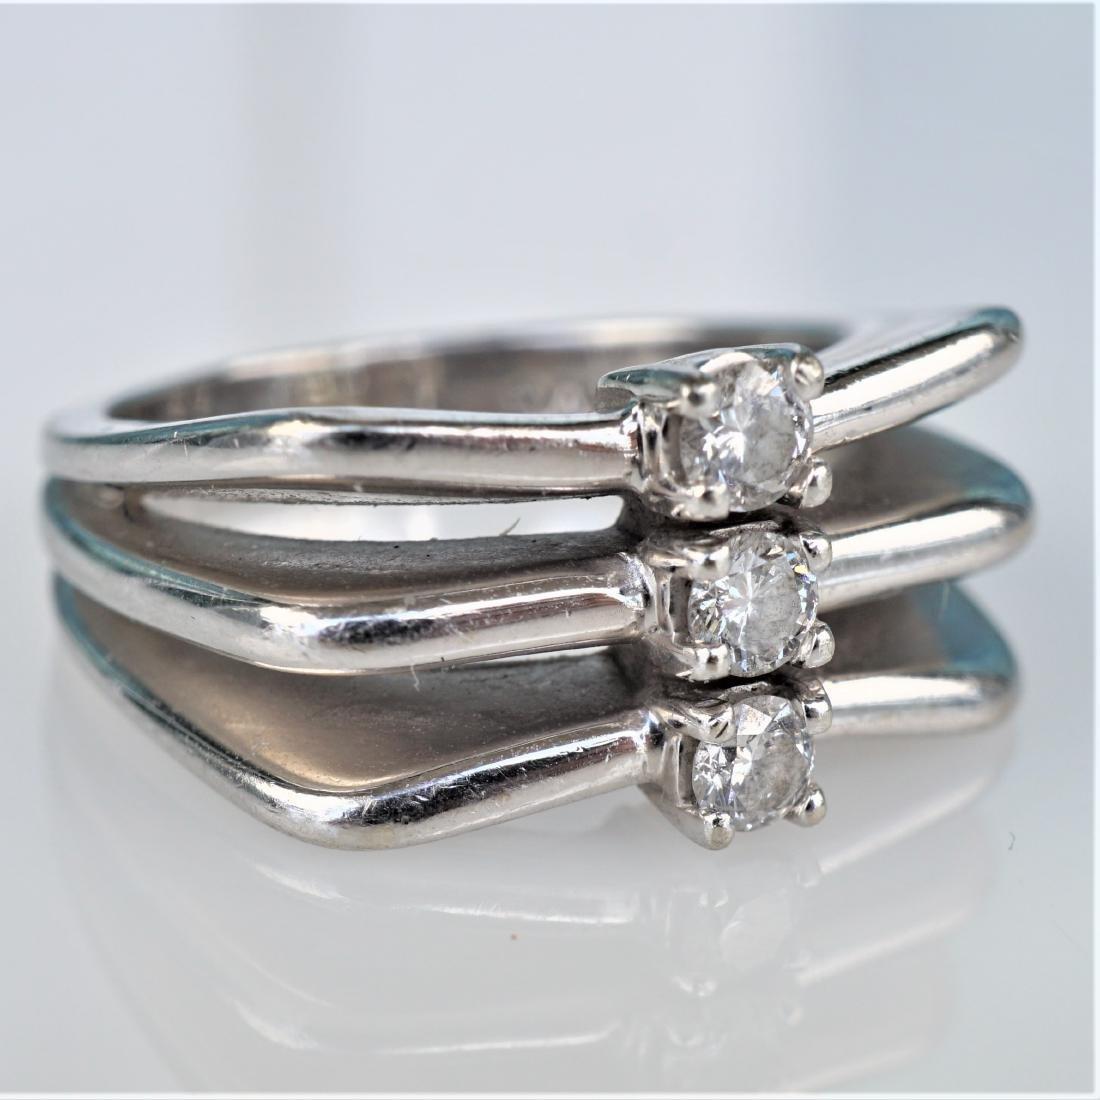 Modernist 14k WG Diamond Ring sz 6.5 - 2